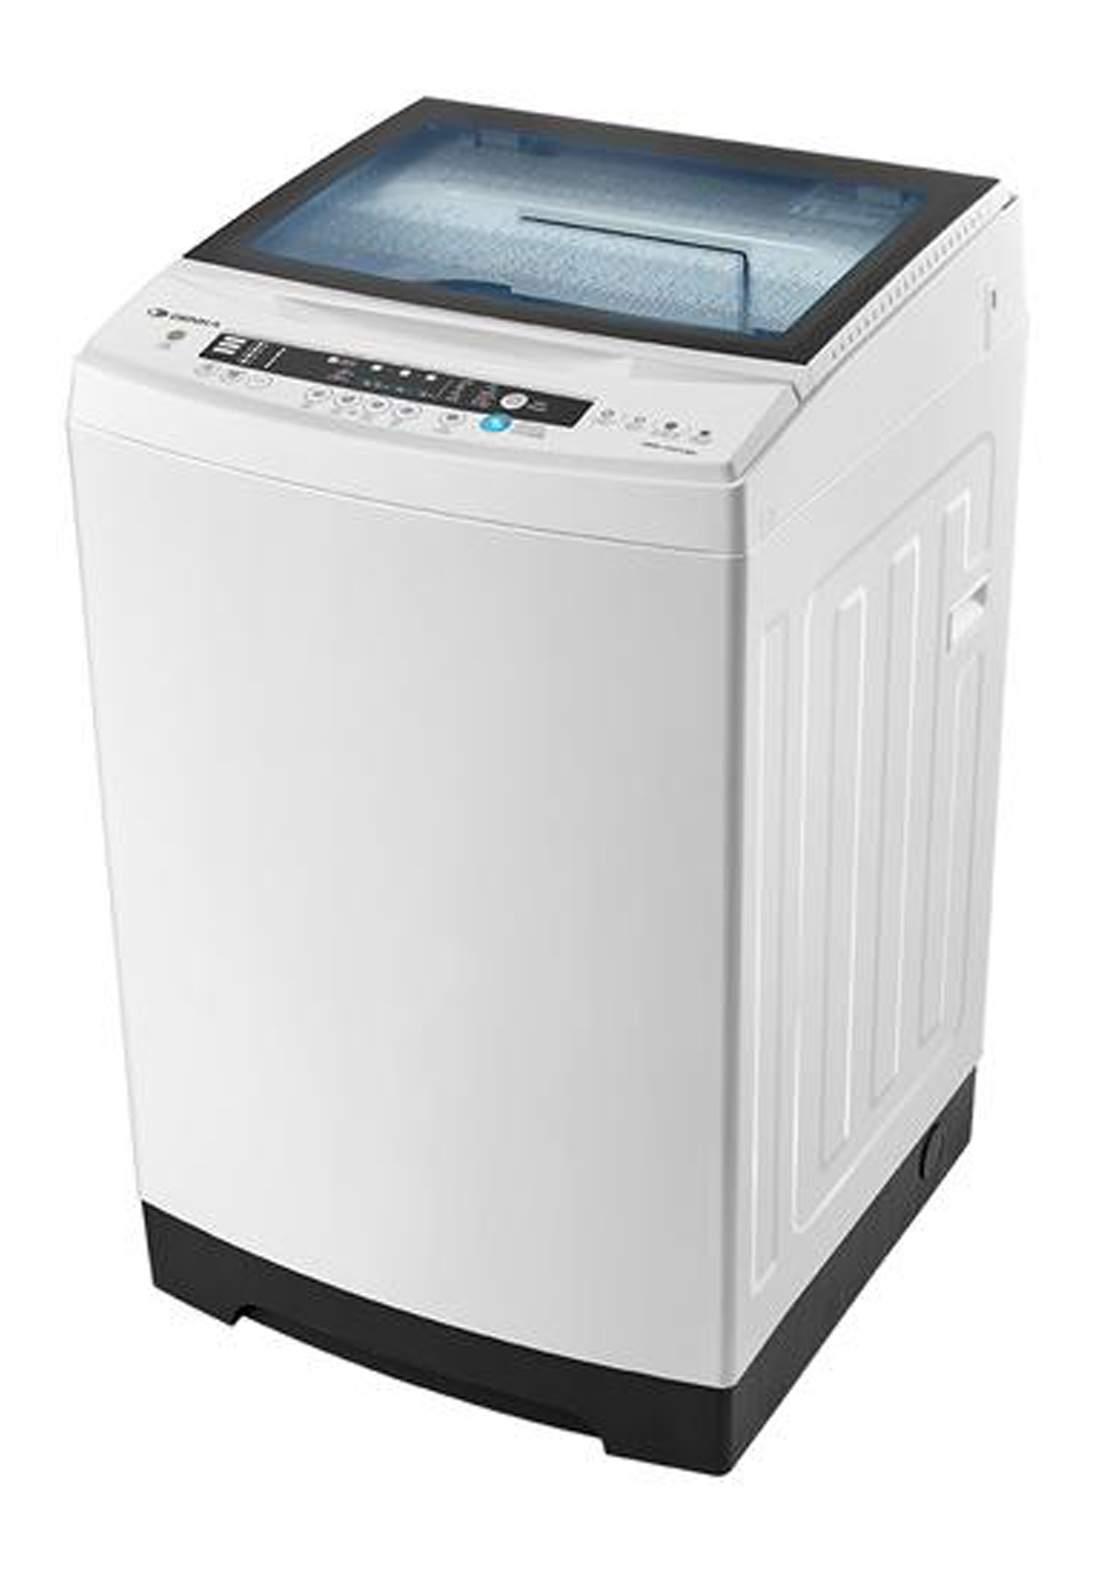 DENKA QWM-1950TLWH washing machine 19.5kg  غسالة ملابس